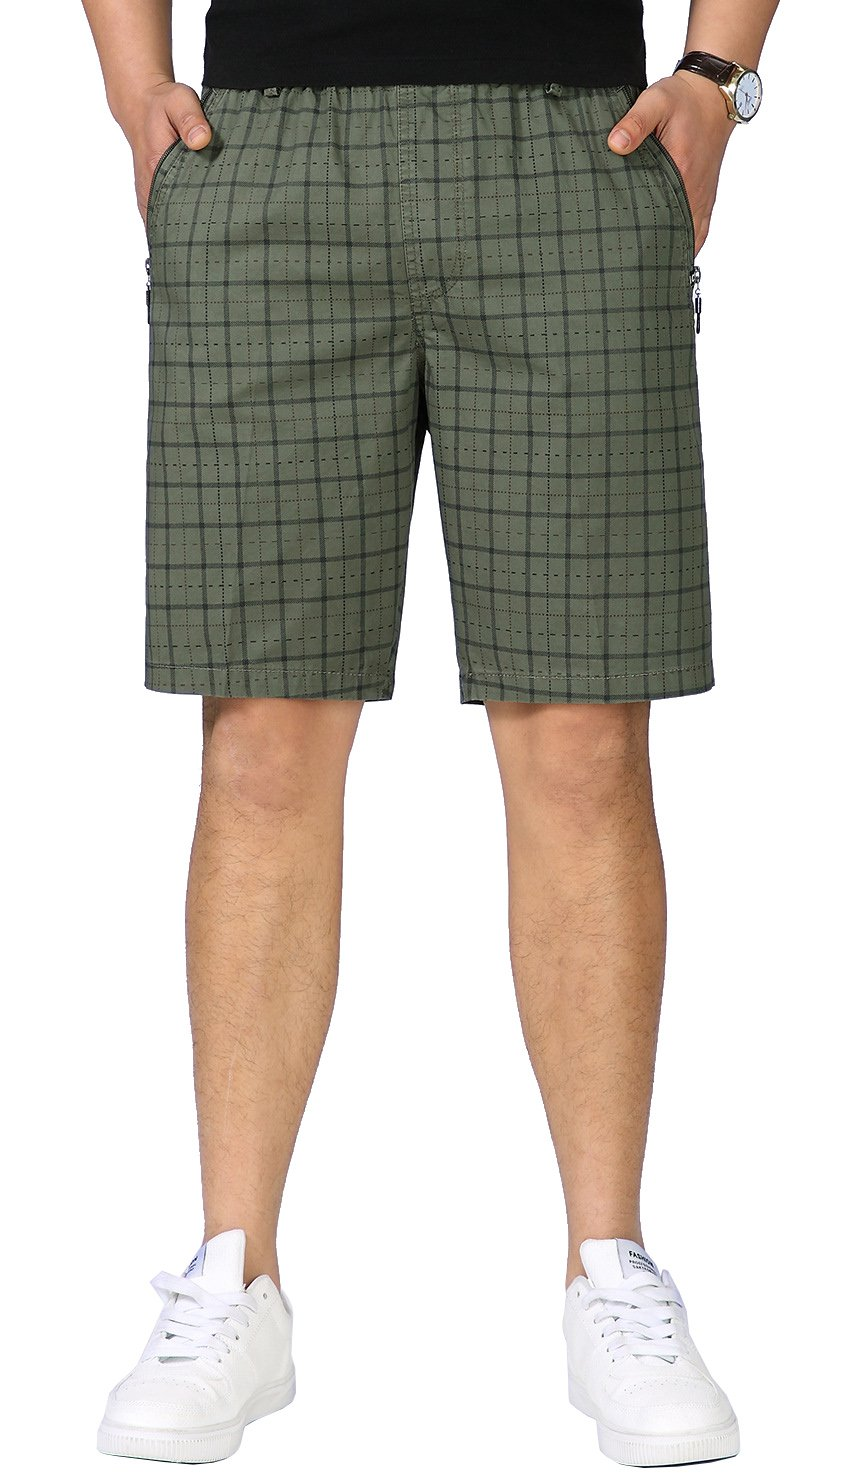 Gihuo Men's Classic Pure Cotton Elastic Waist Comfort Plaid Short (Army Green, M)